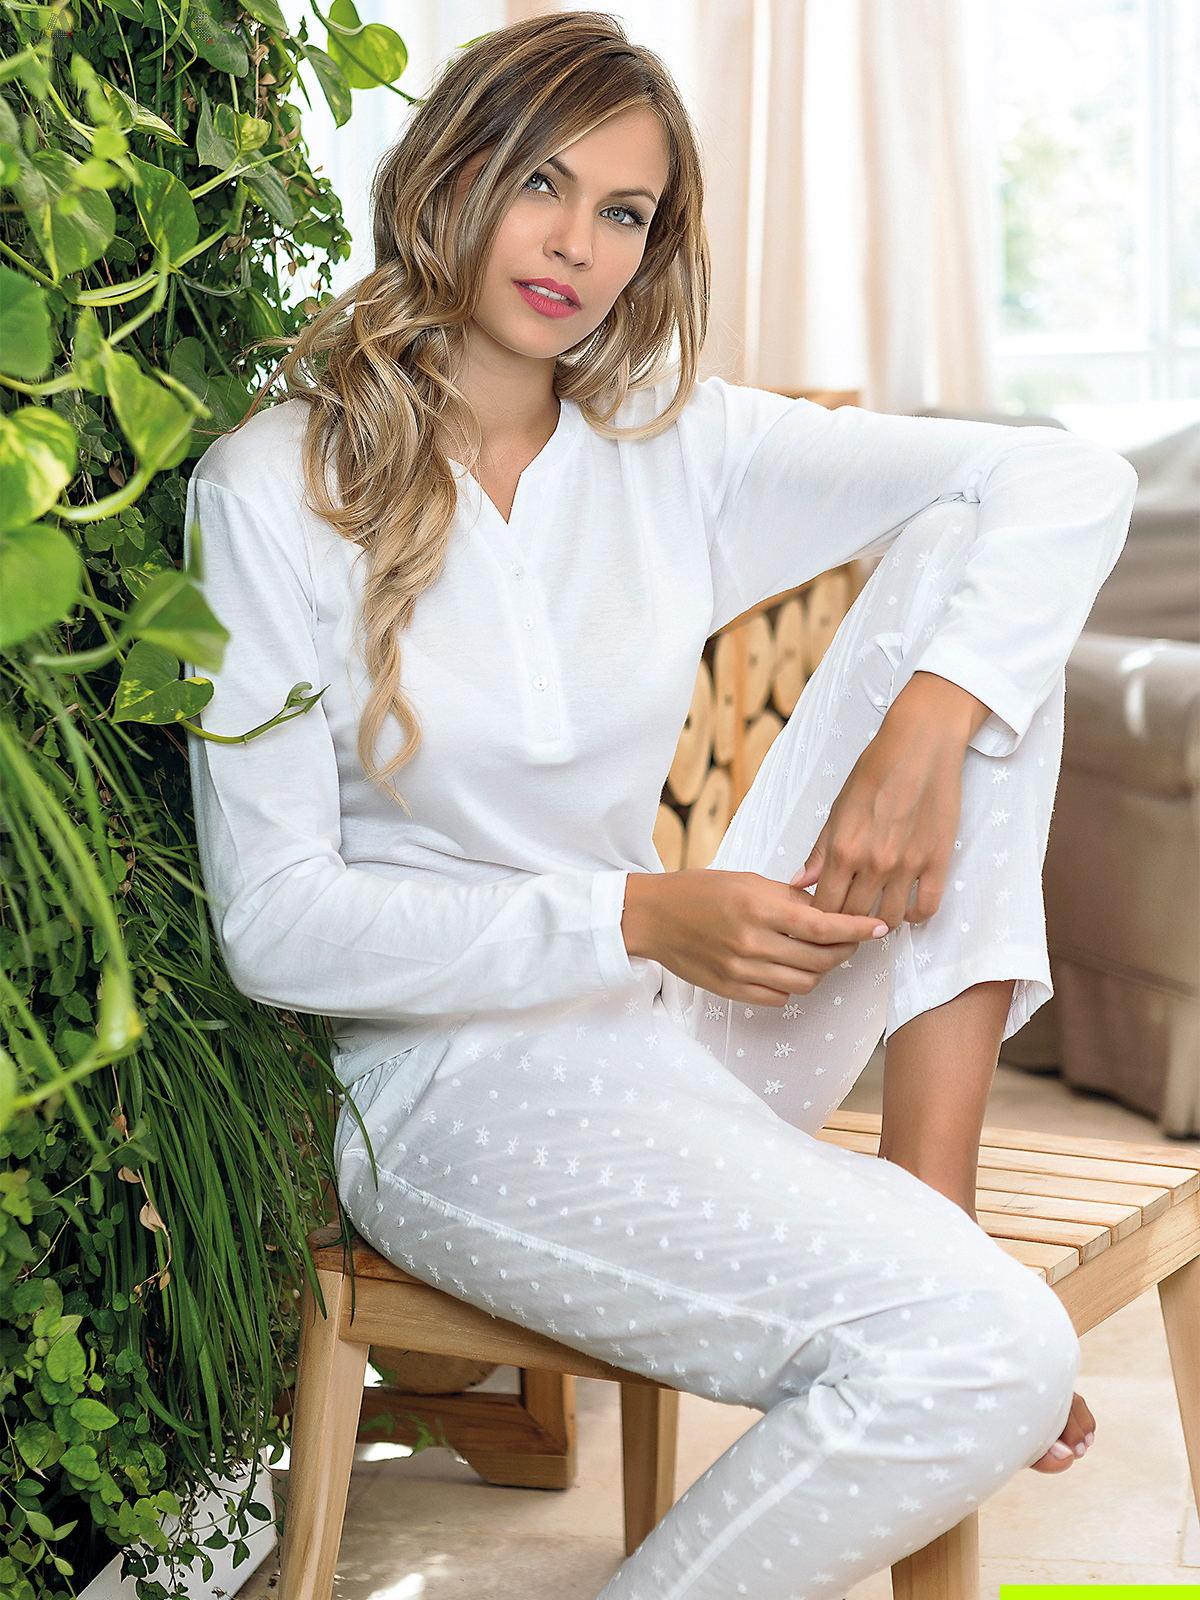 e50904a904ce Пижама Jadea JADEA 3077 lunga купить недорого|Бесплатная доставка!